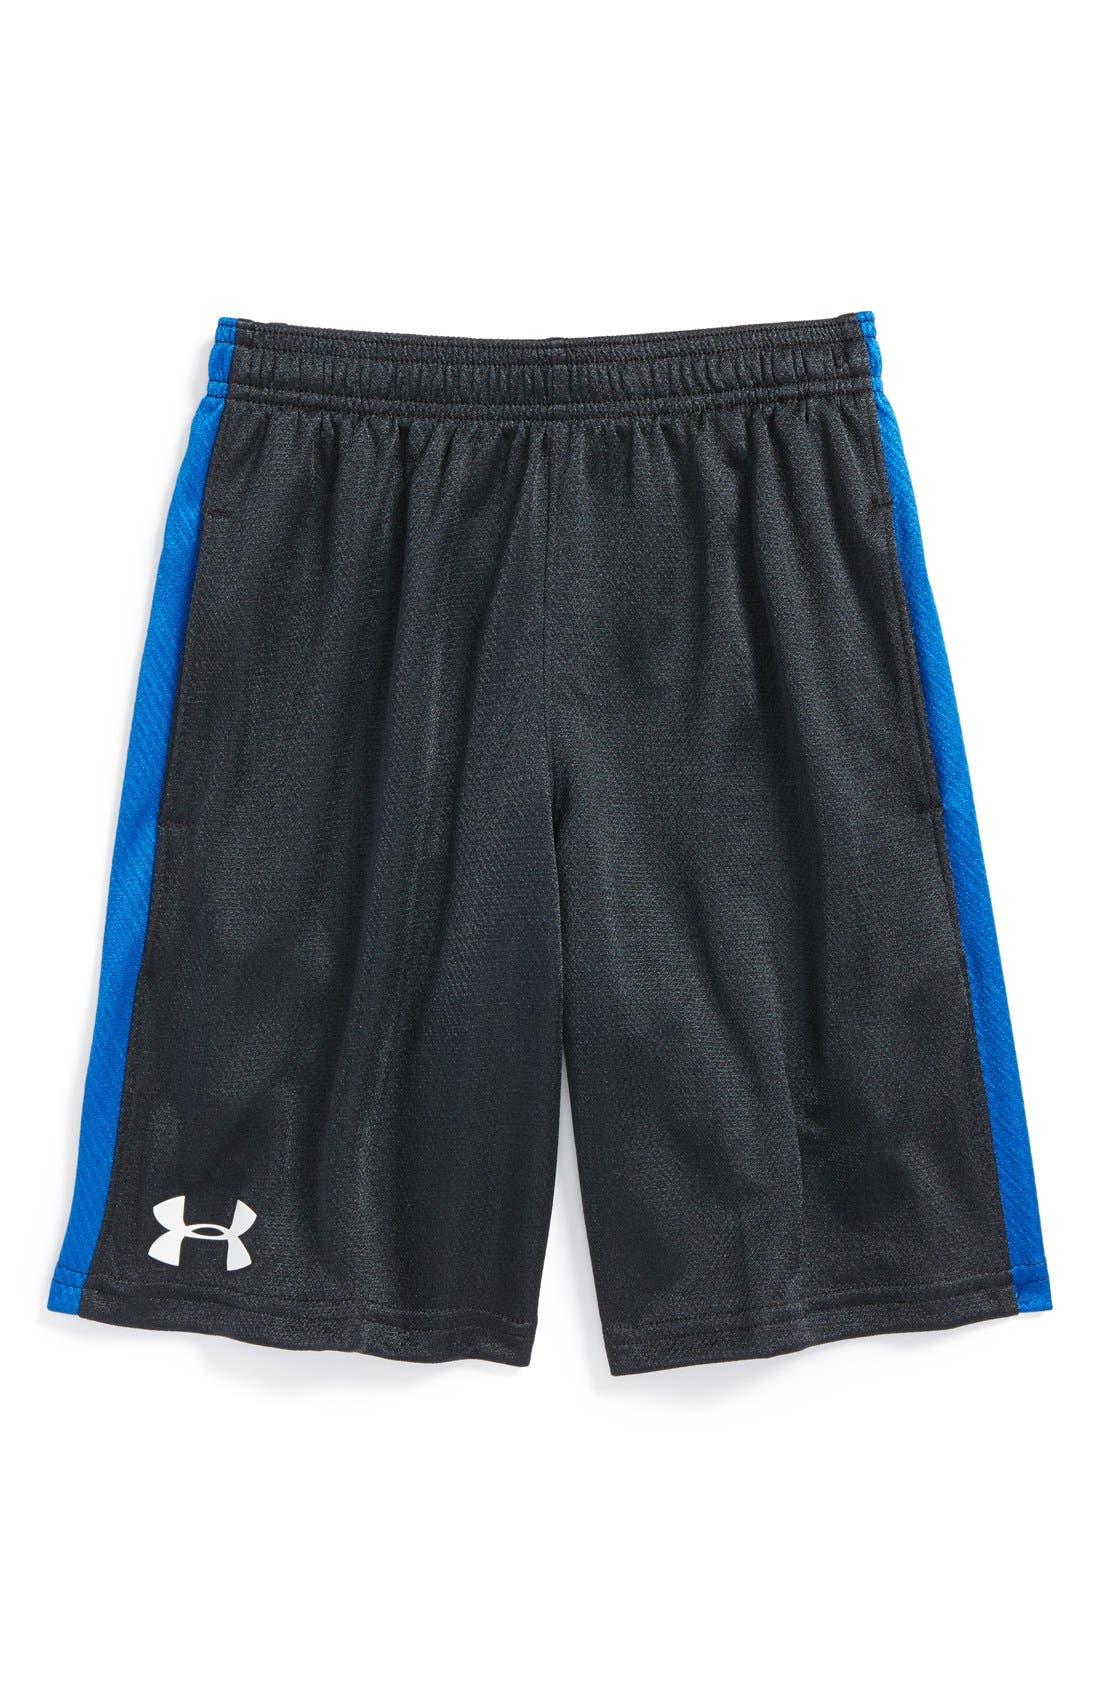 Main Image - Under Armour 'Ultimate' Shorts (Big Boys)